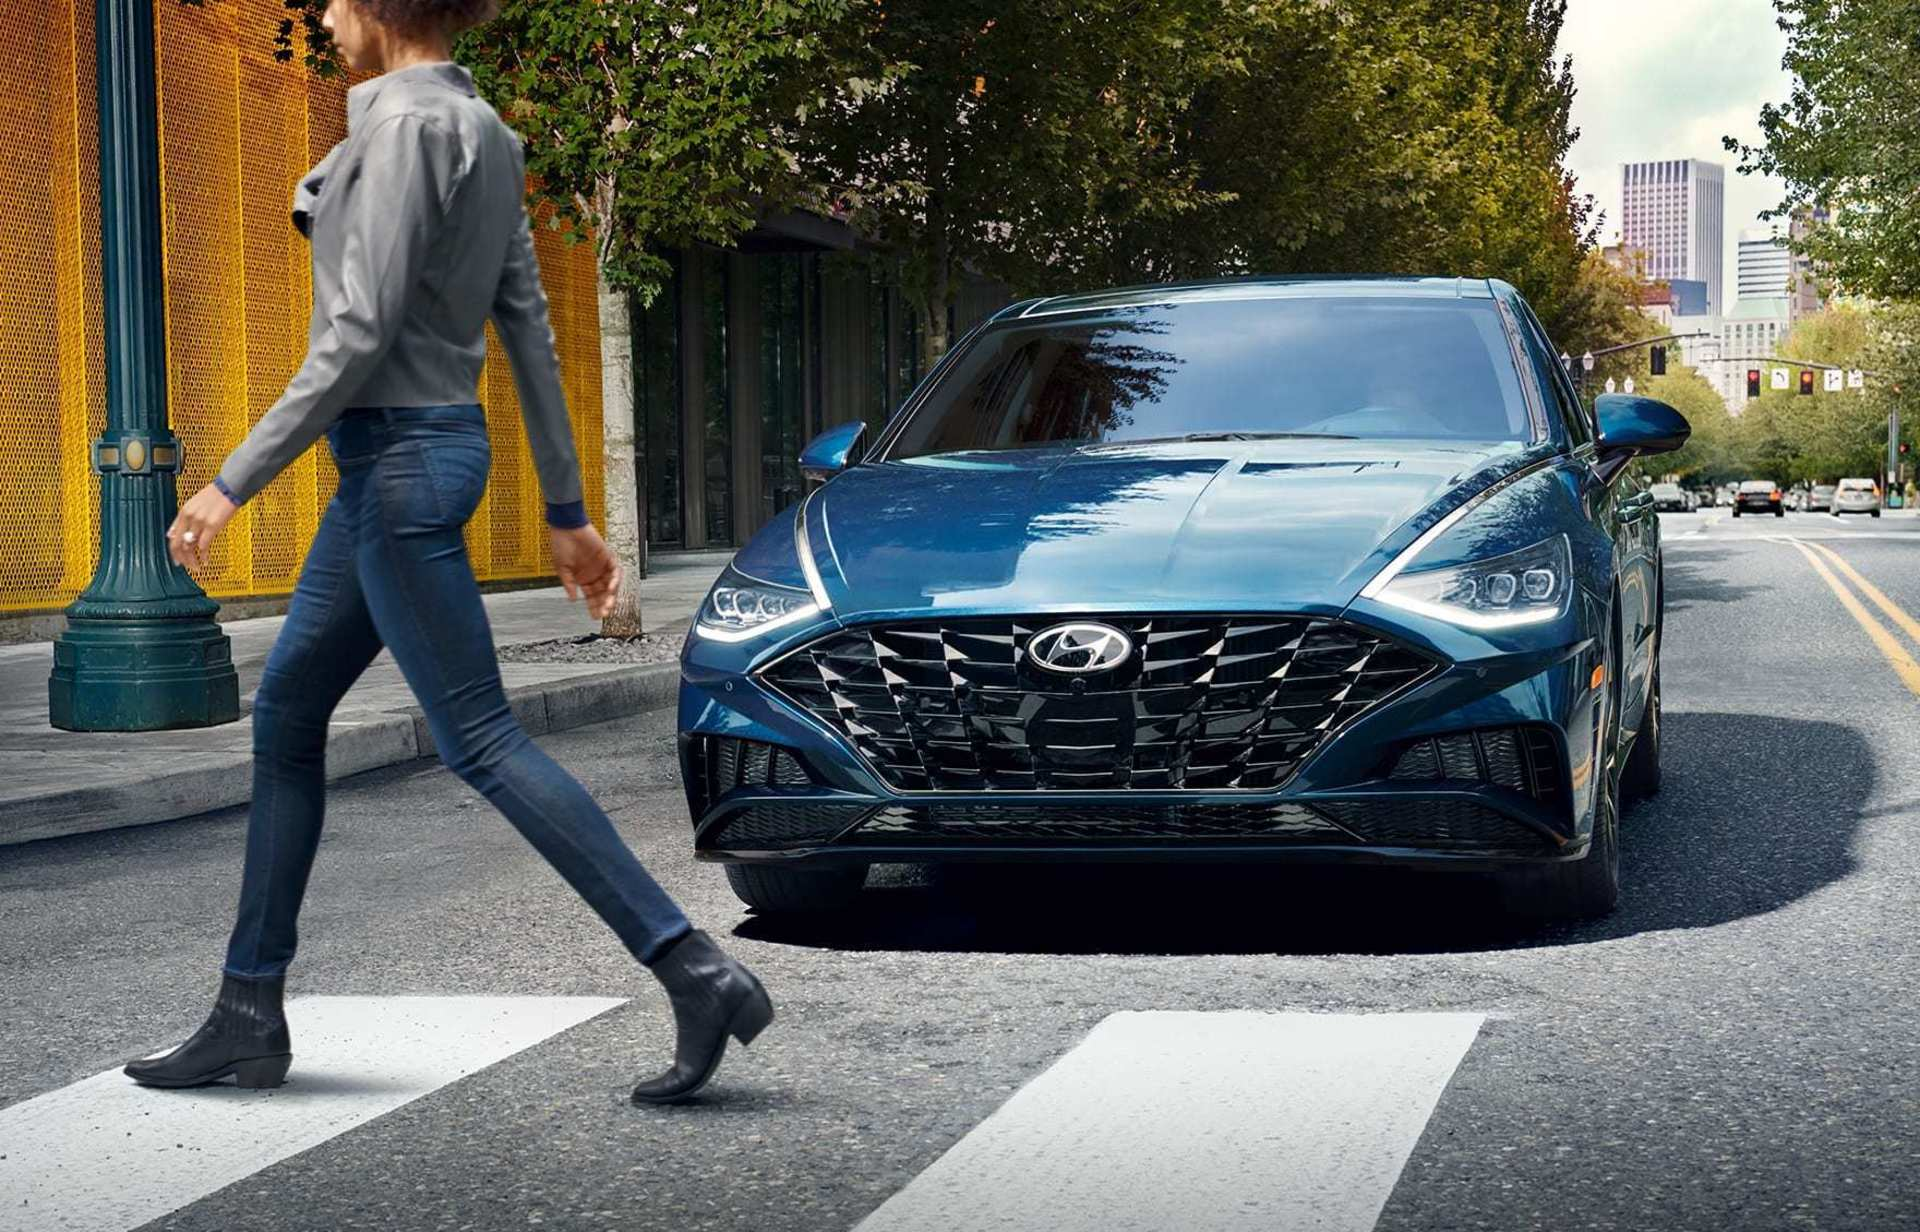 2020 Hyundai Sonata Leasing near Manassas, VA